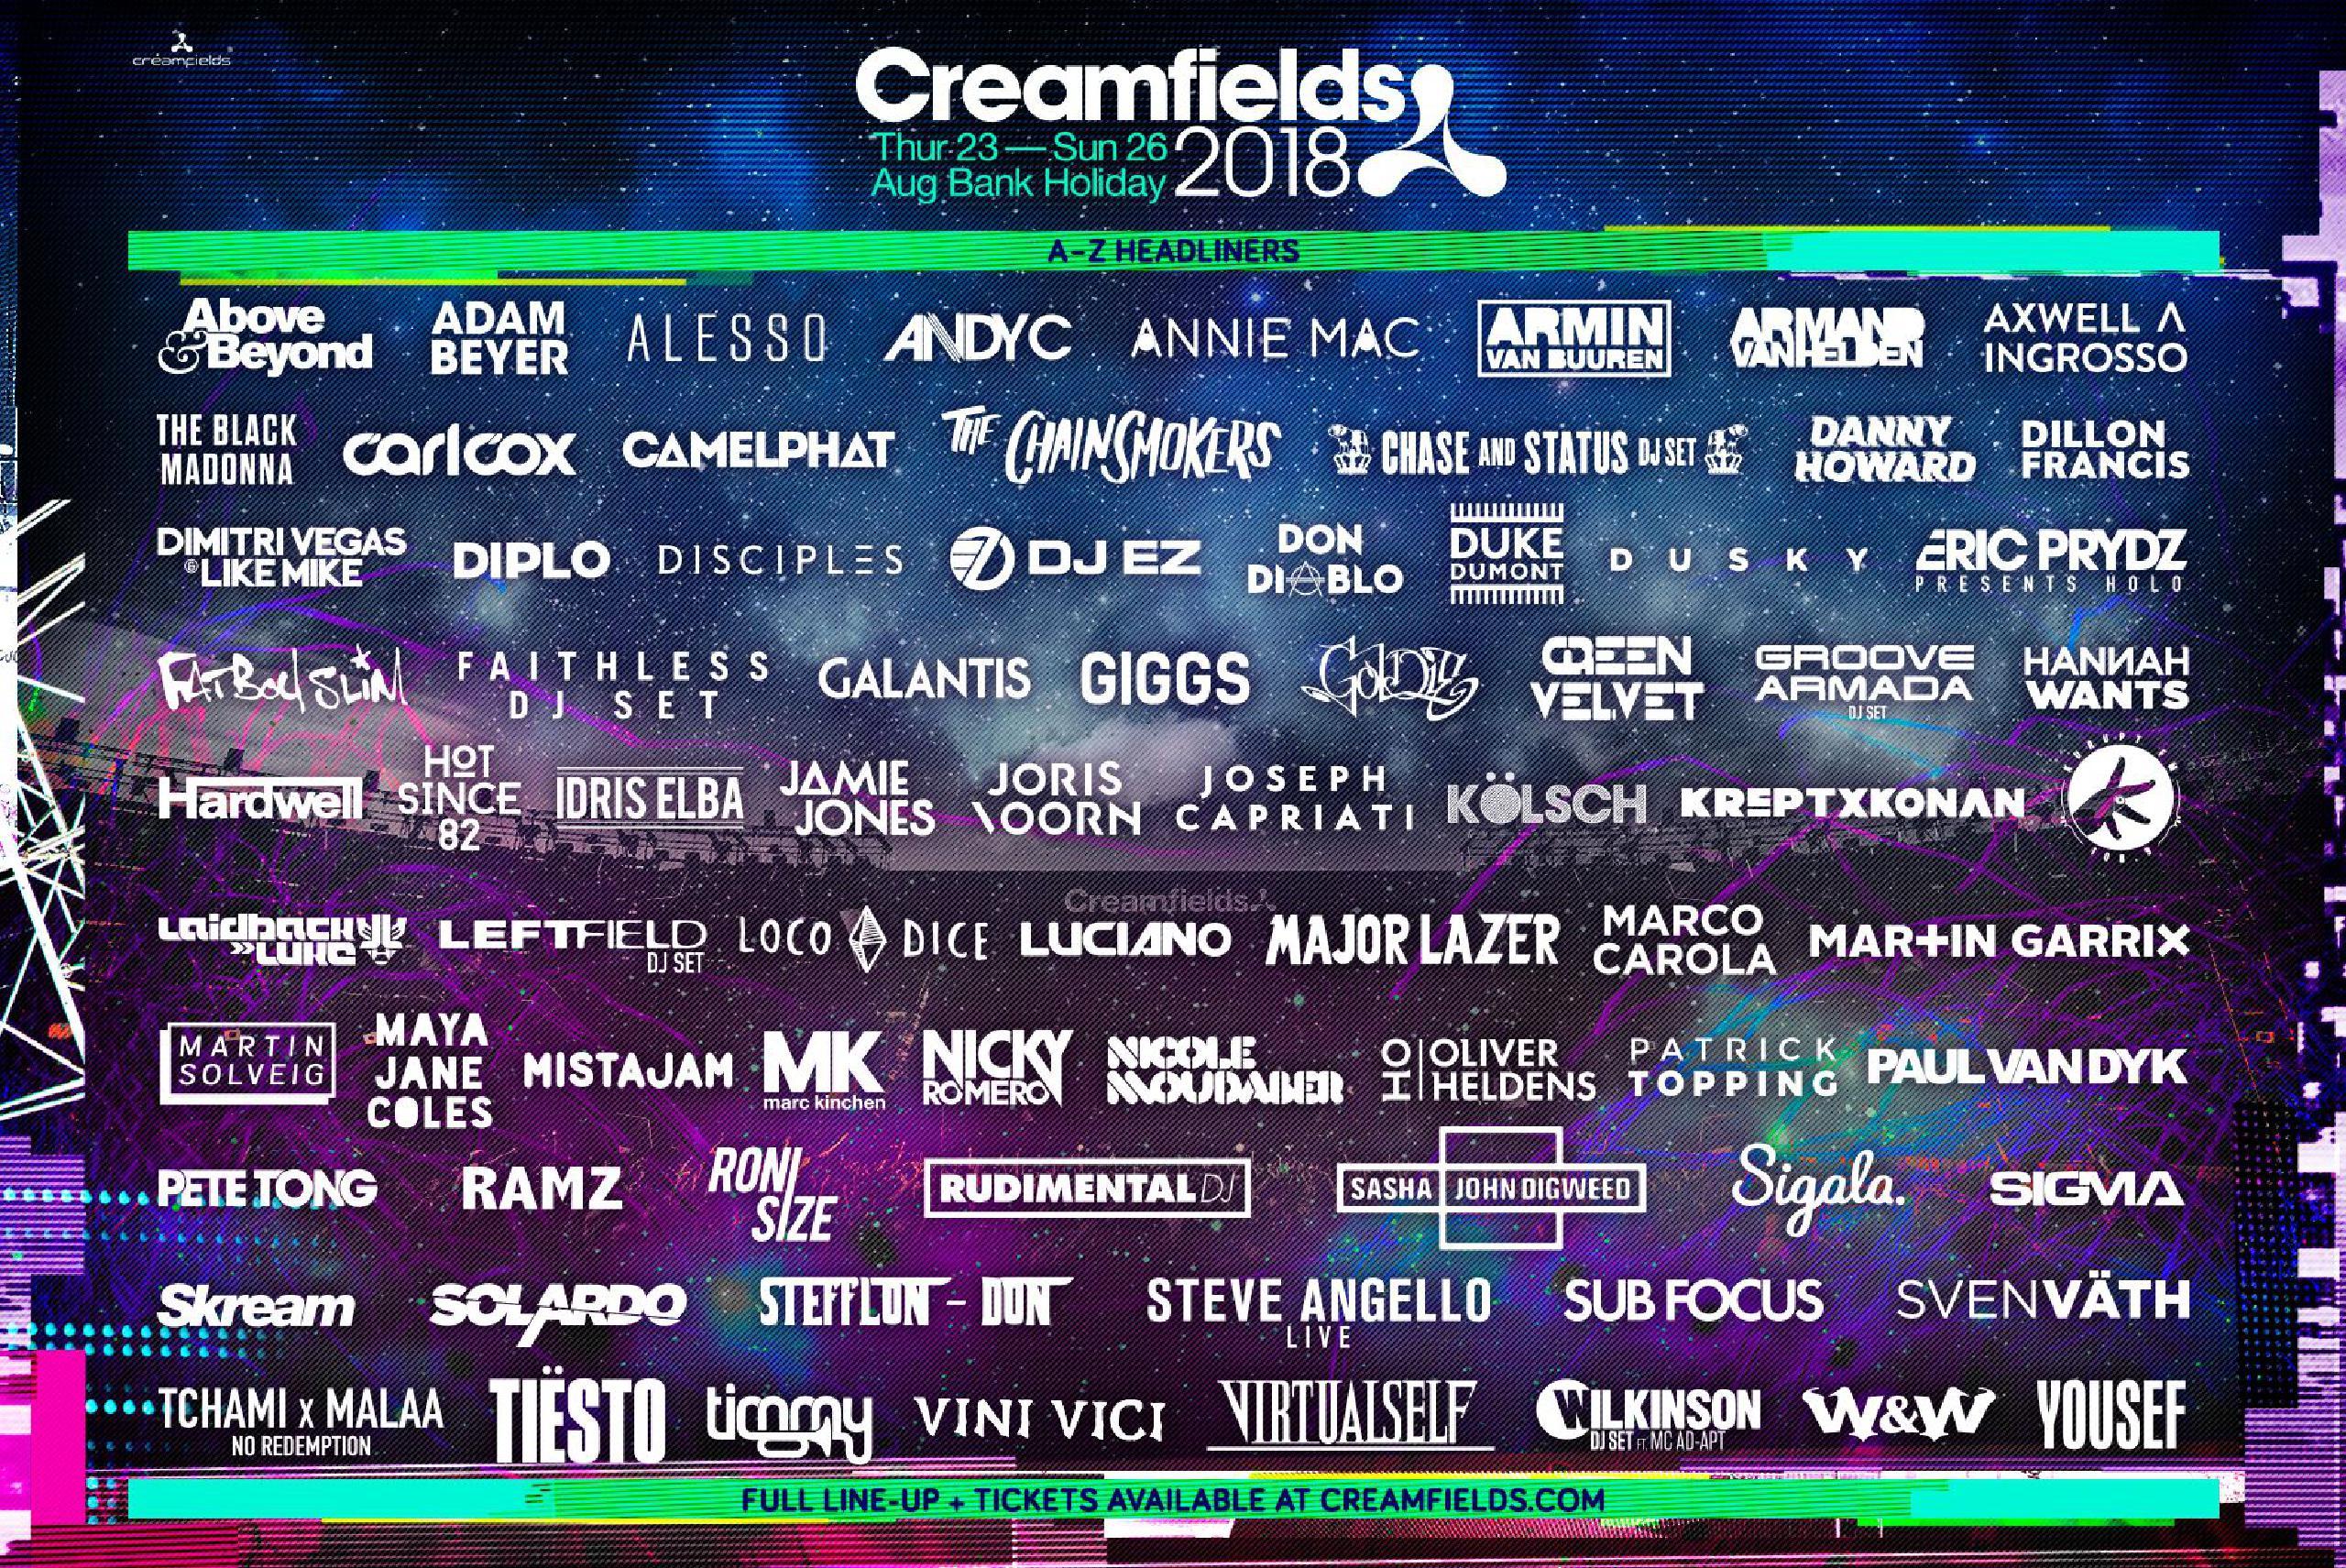 Creamfields Festival 2018 line-up